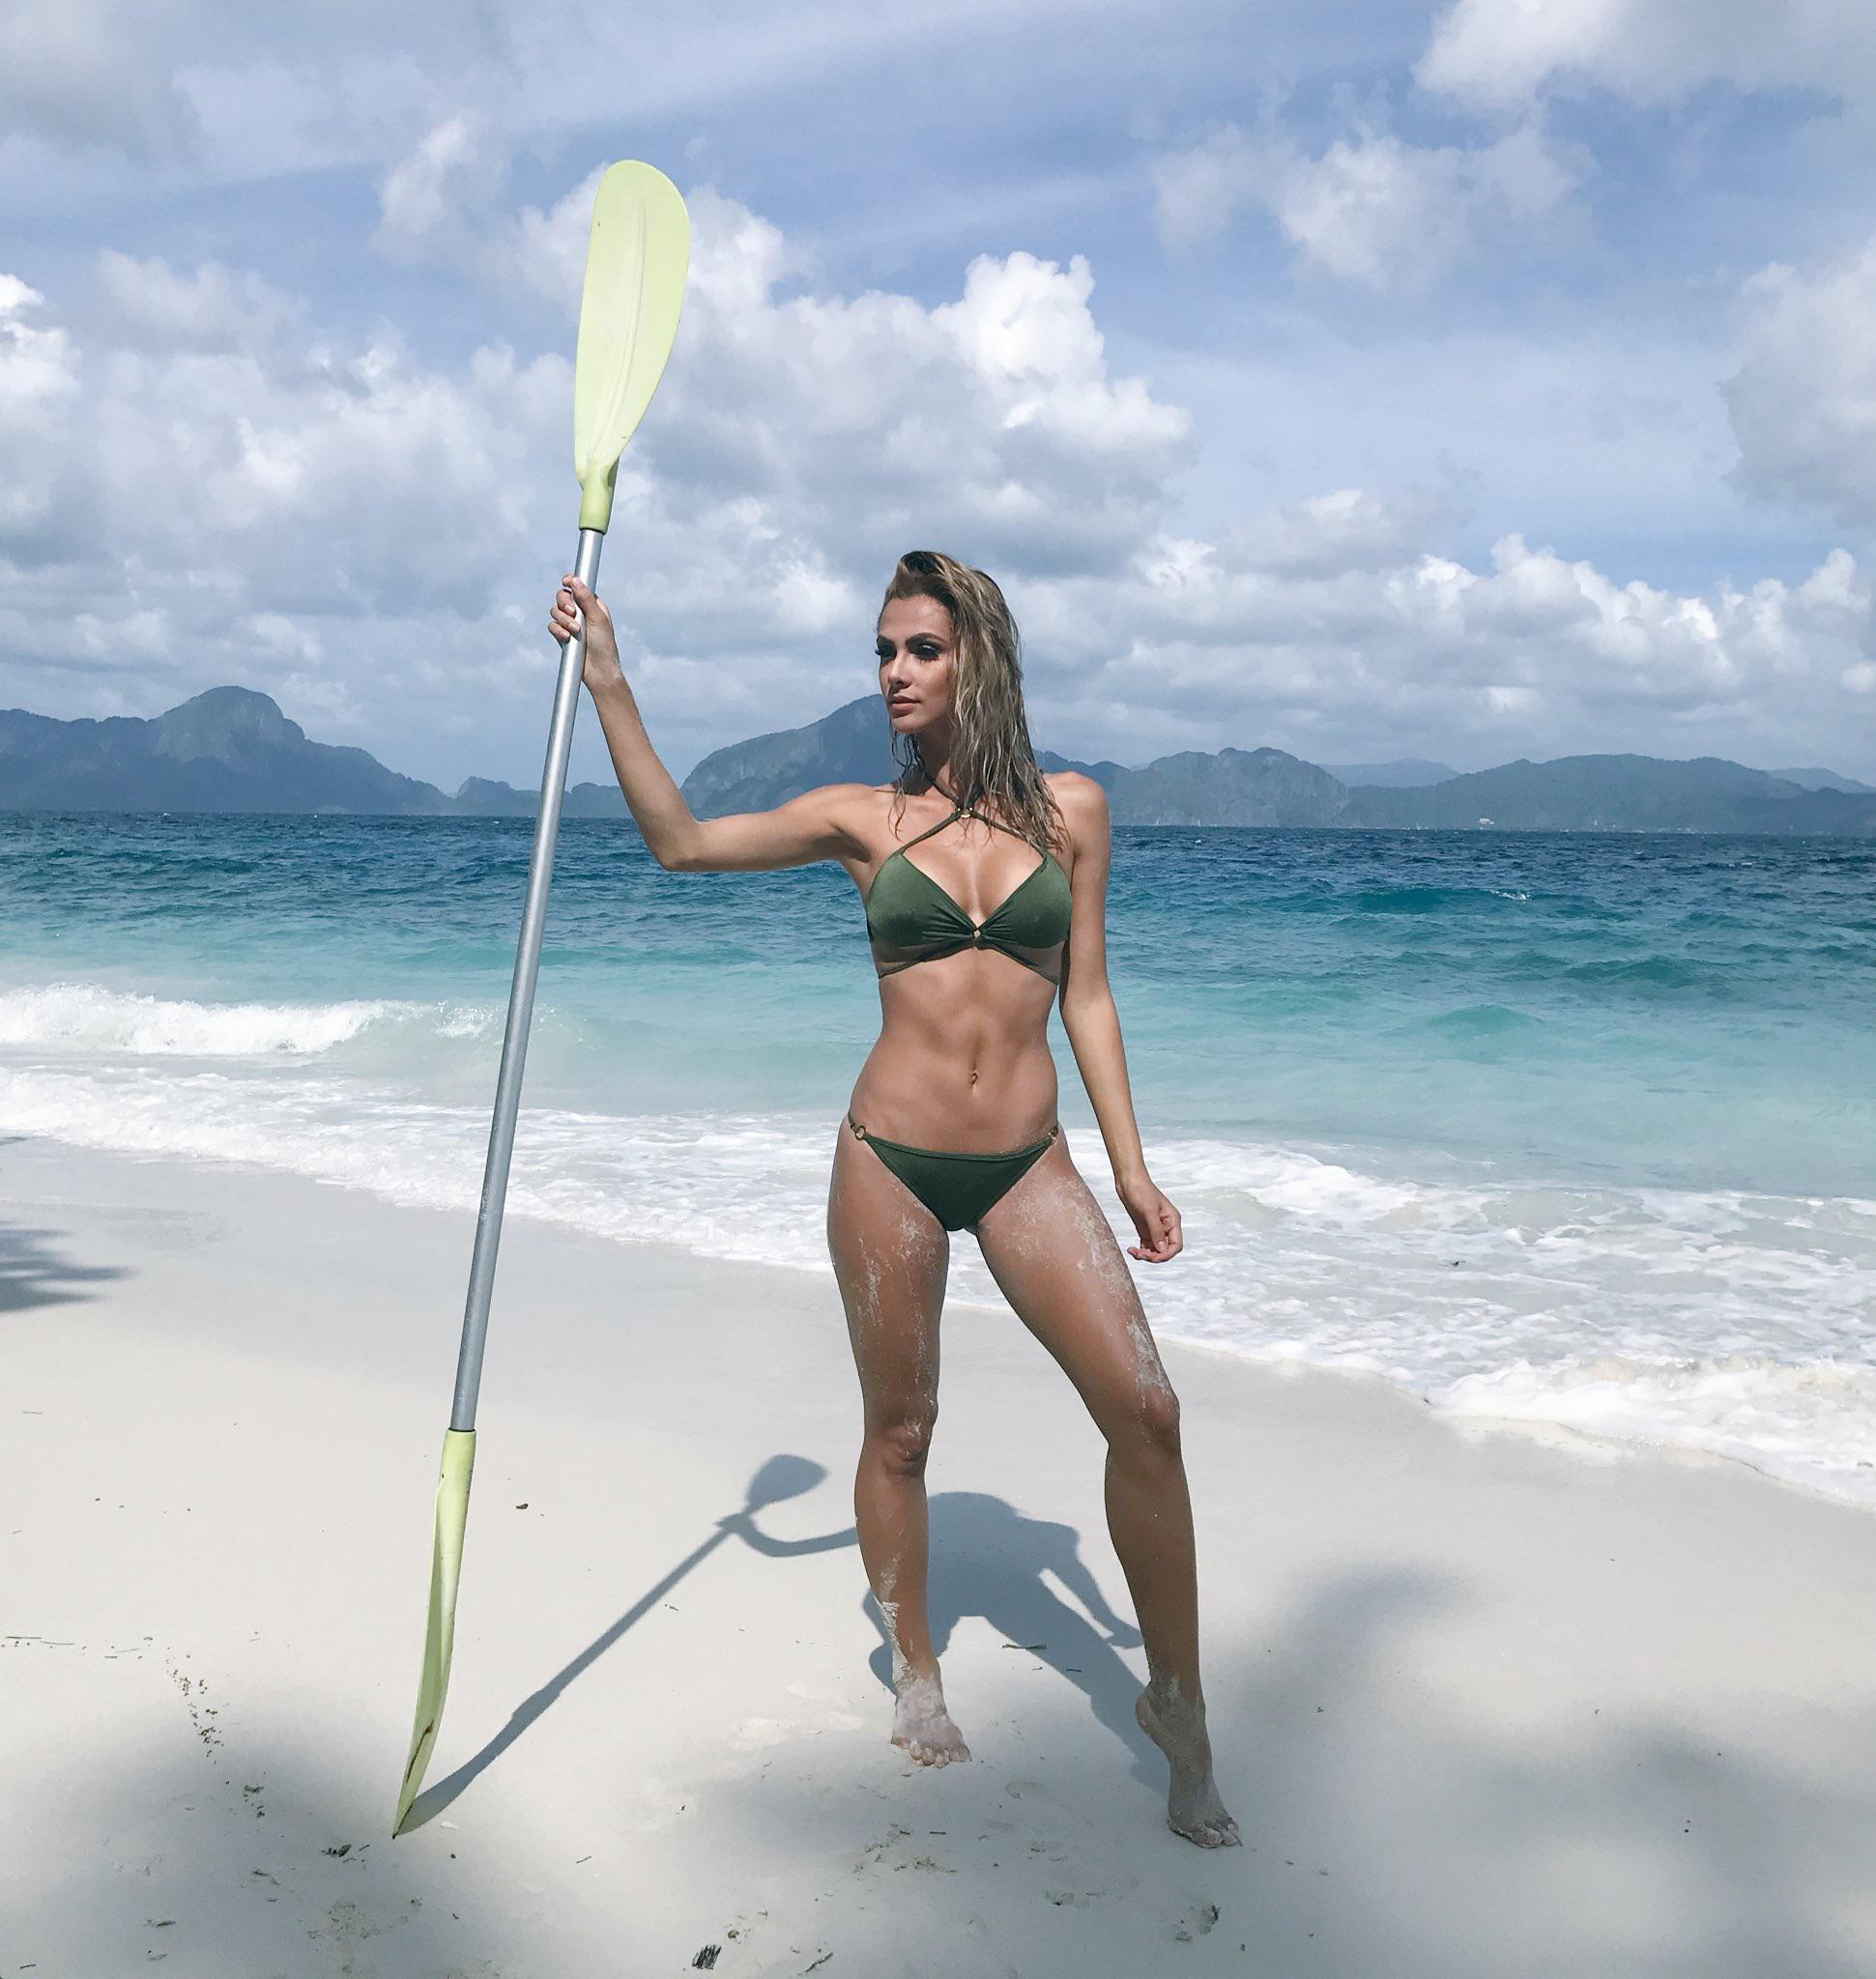 Hot Karina Ramos nudes (63 photos), Sexy, Leaked, Selfie, cleavage 2017